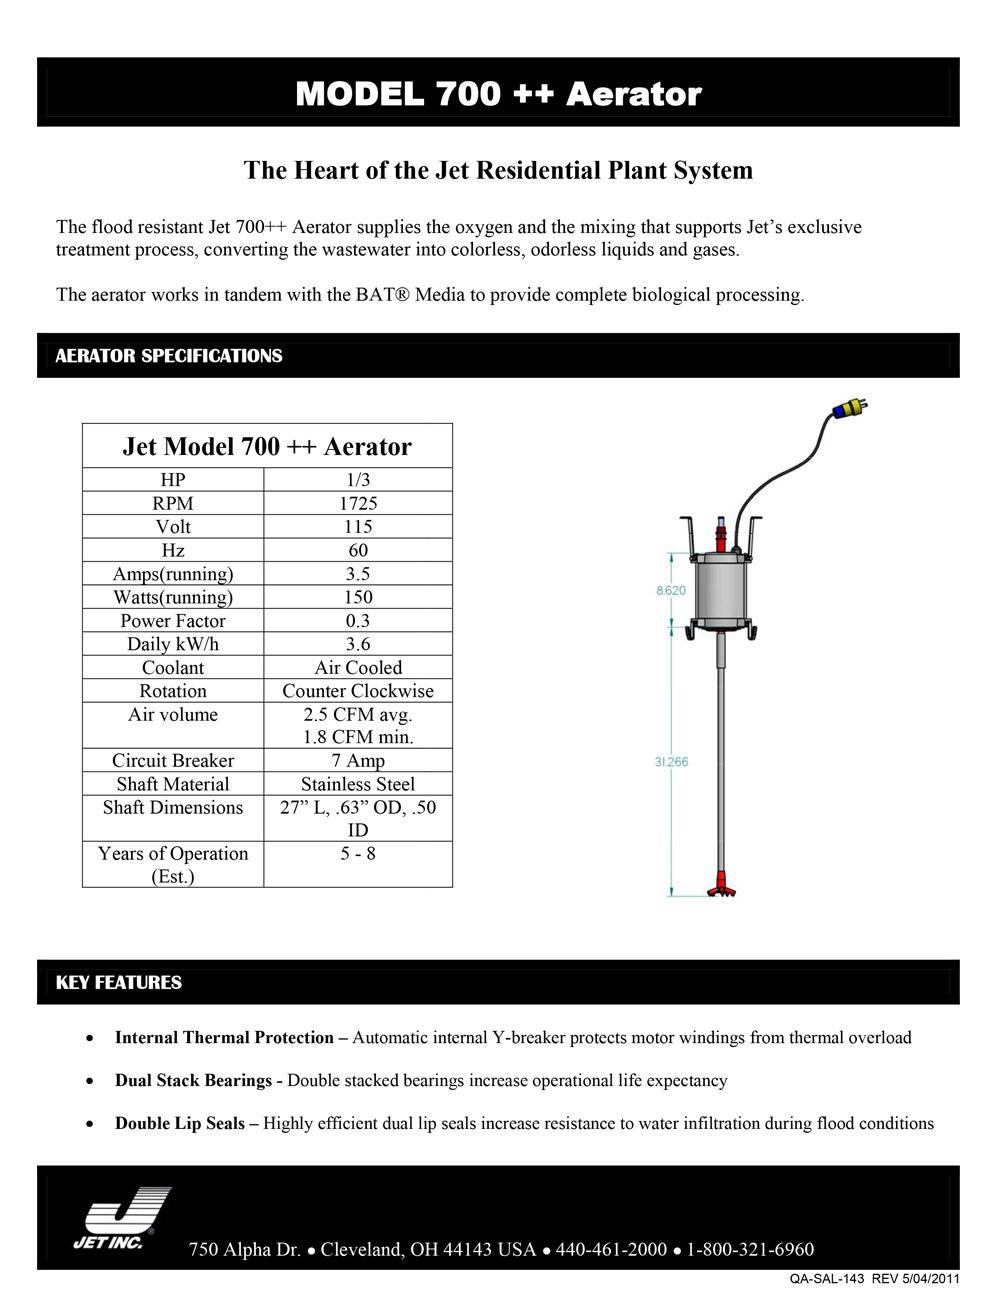 Model 700+ Aerator document image